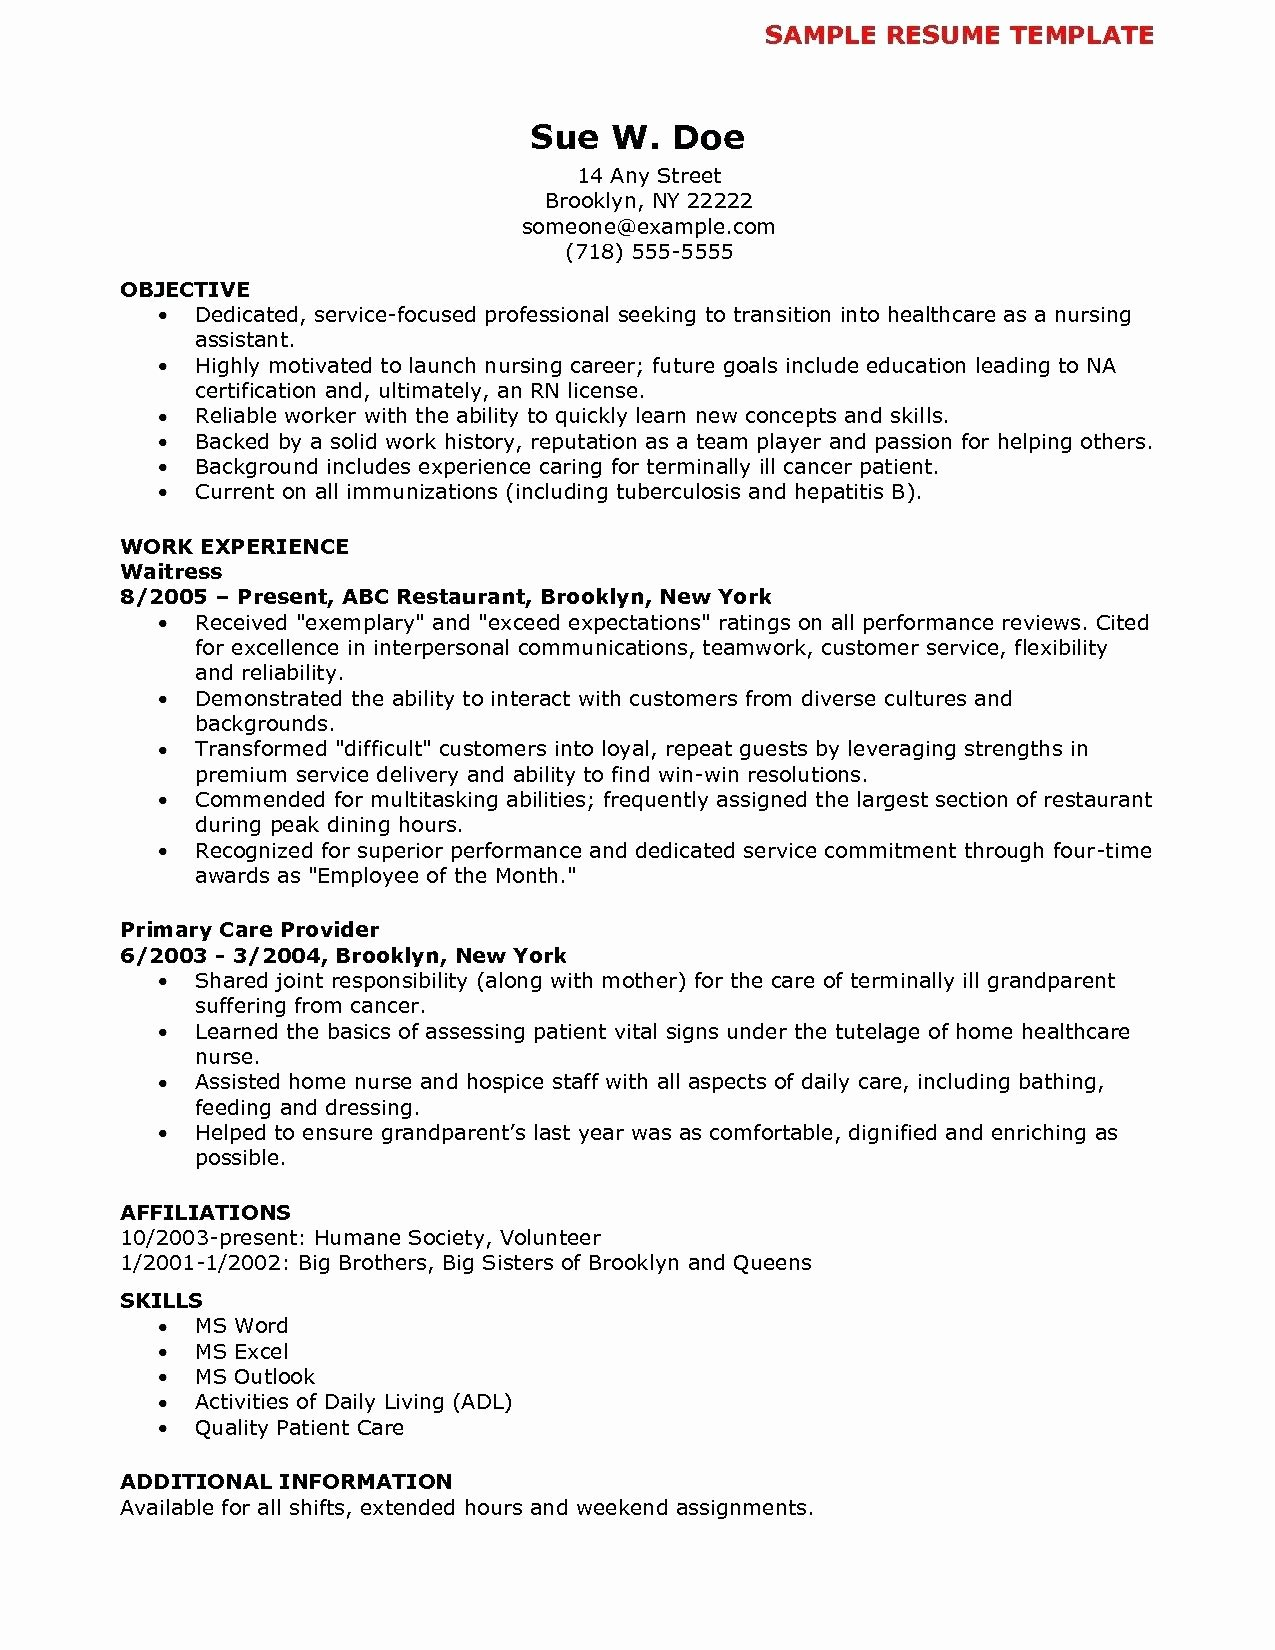 Social Media Resume Template Best Of Resume social Media Resume